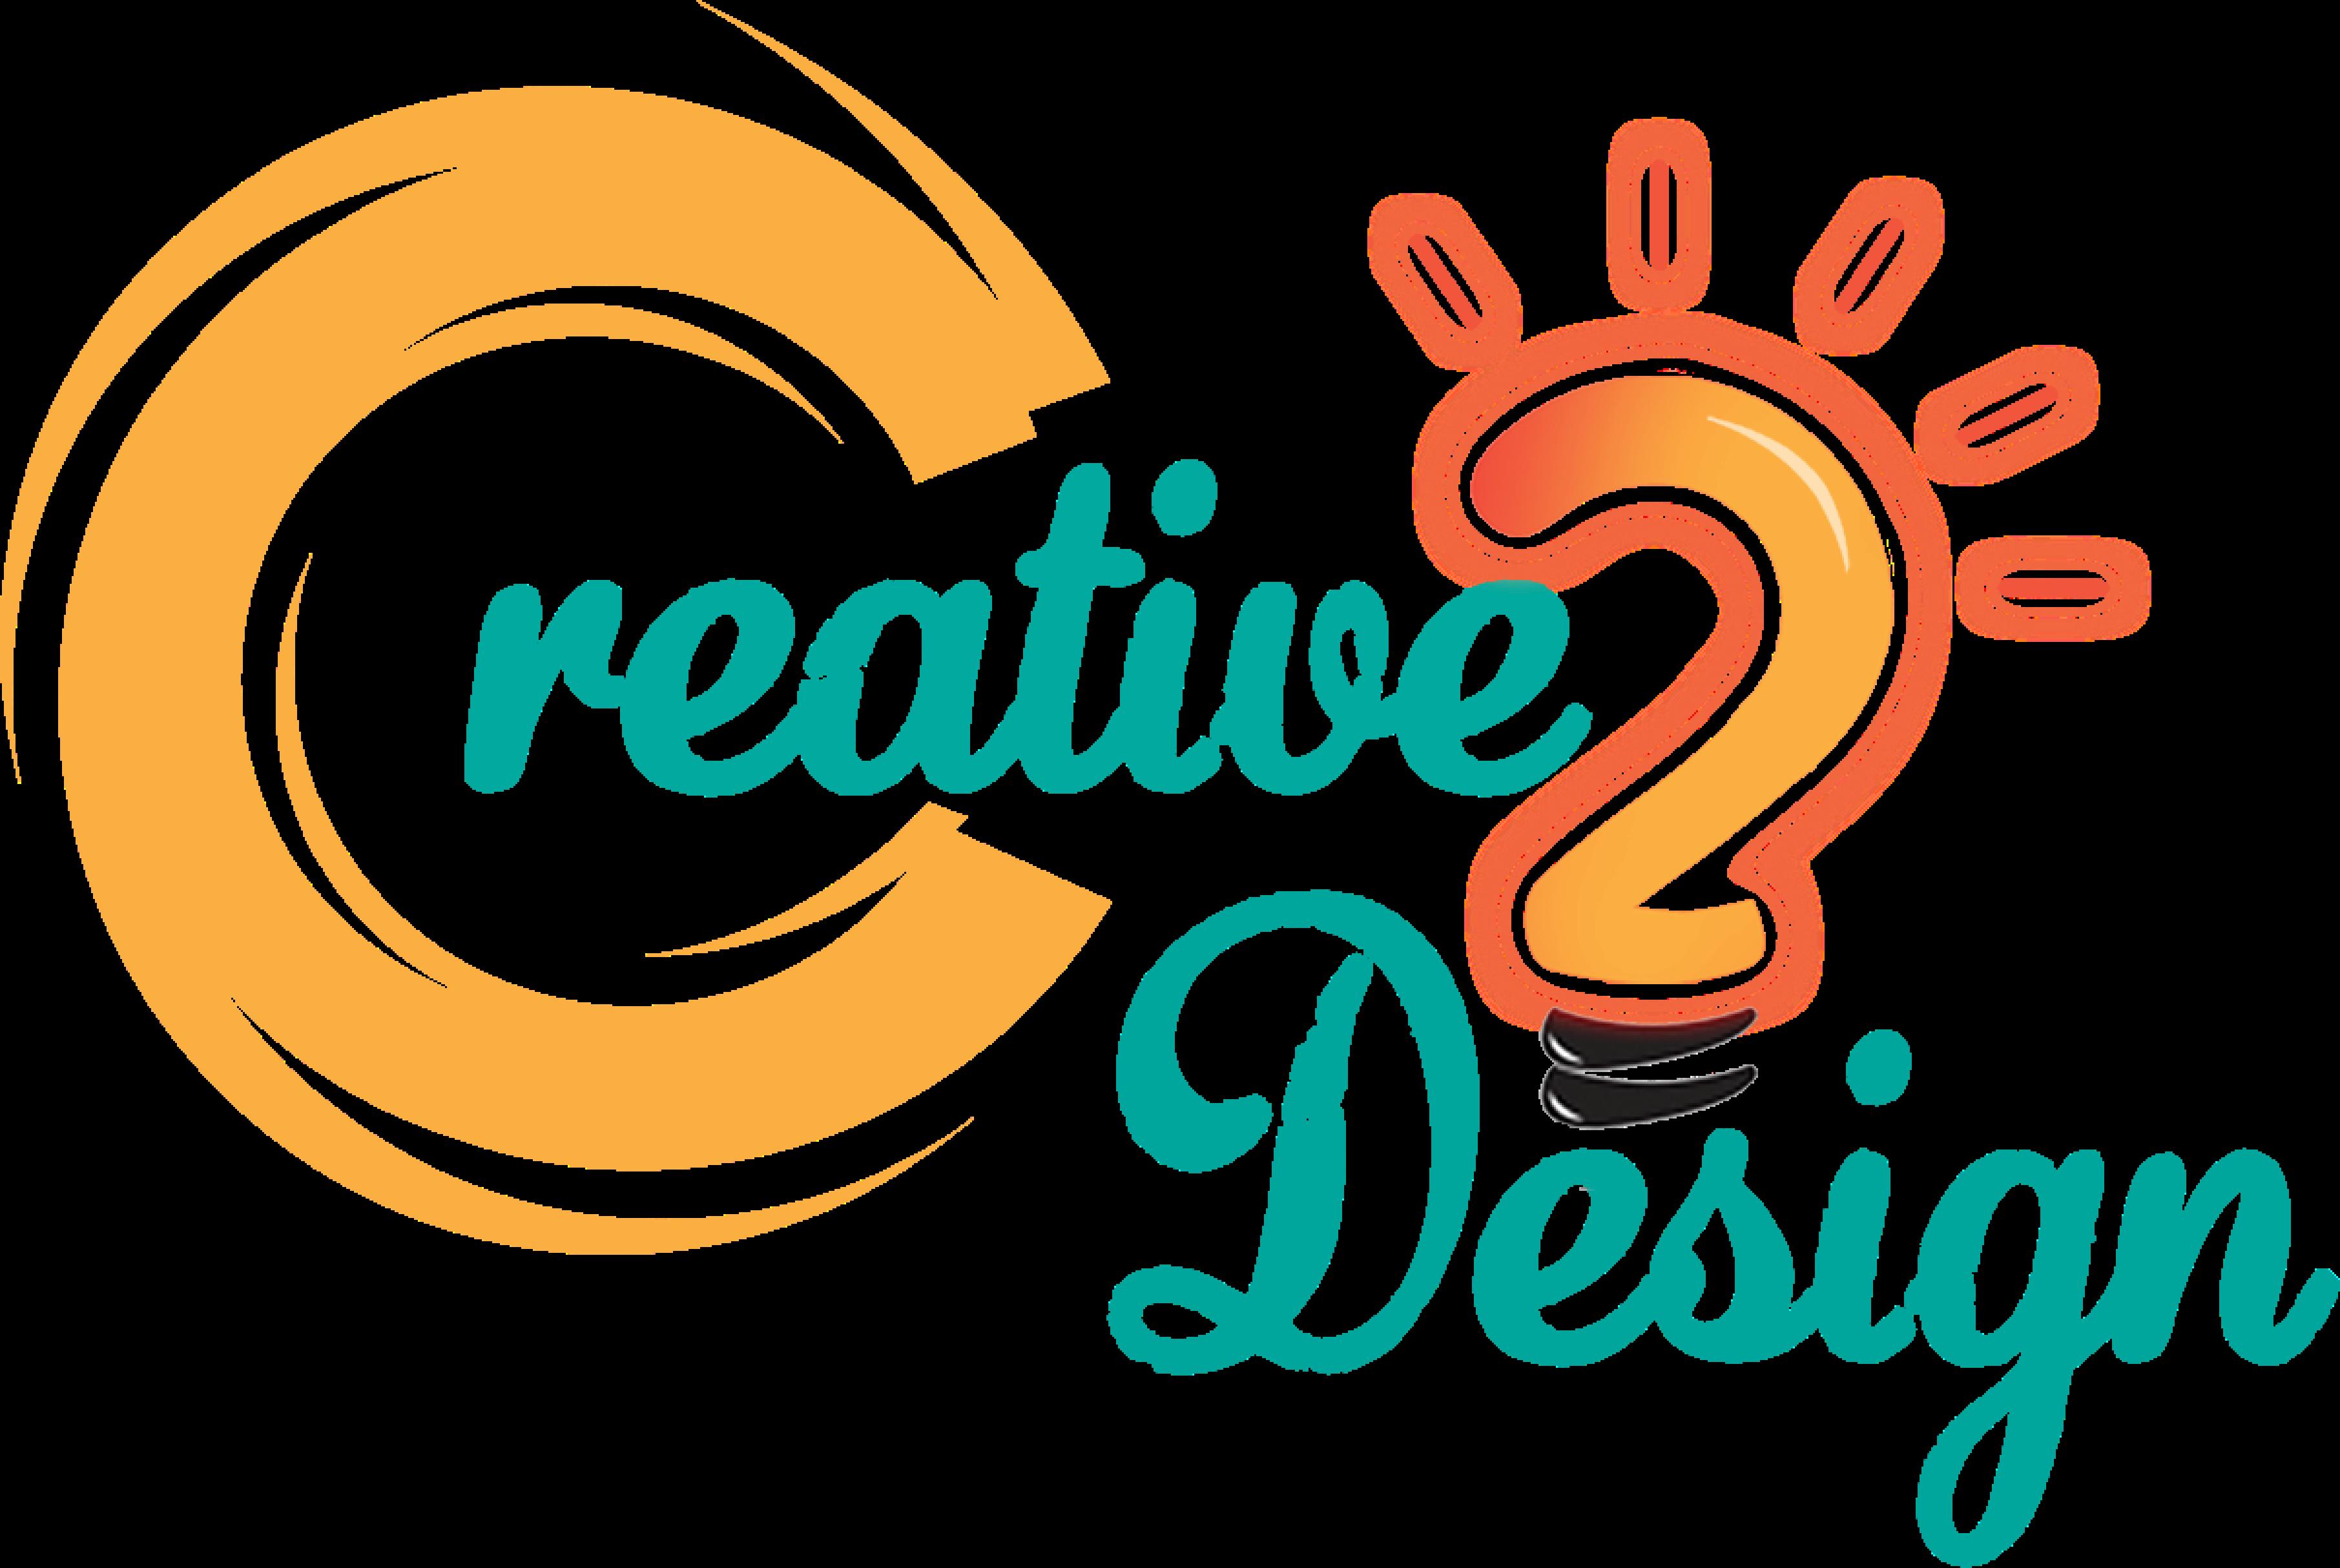 Creative 2 Design